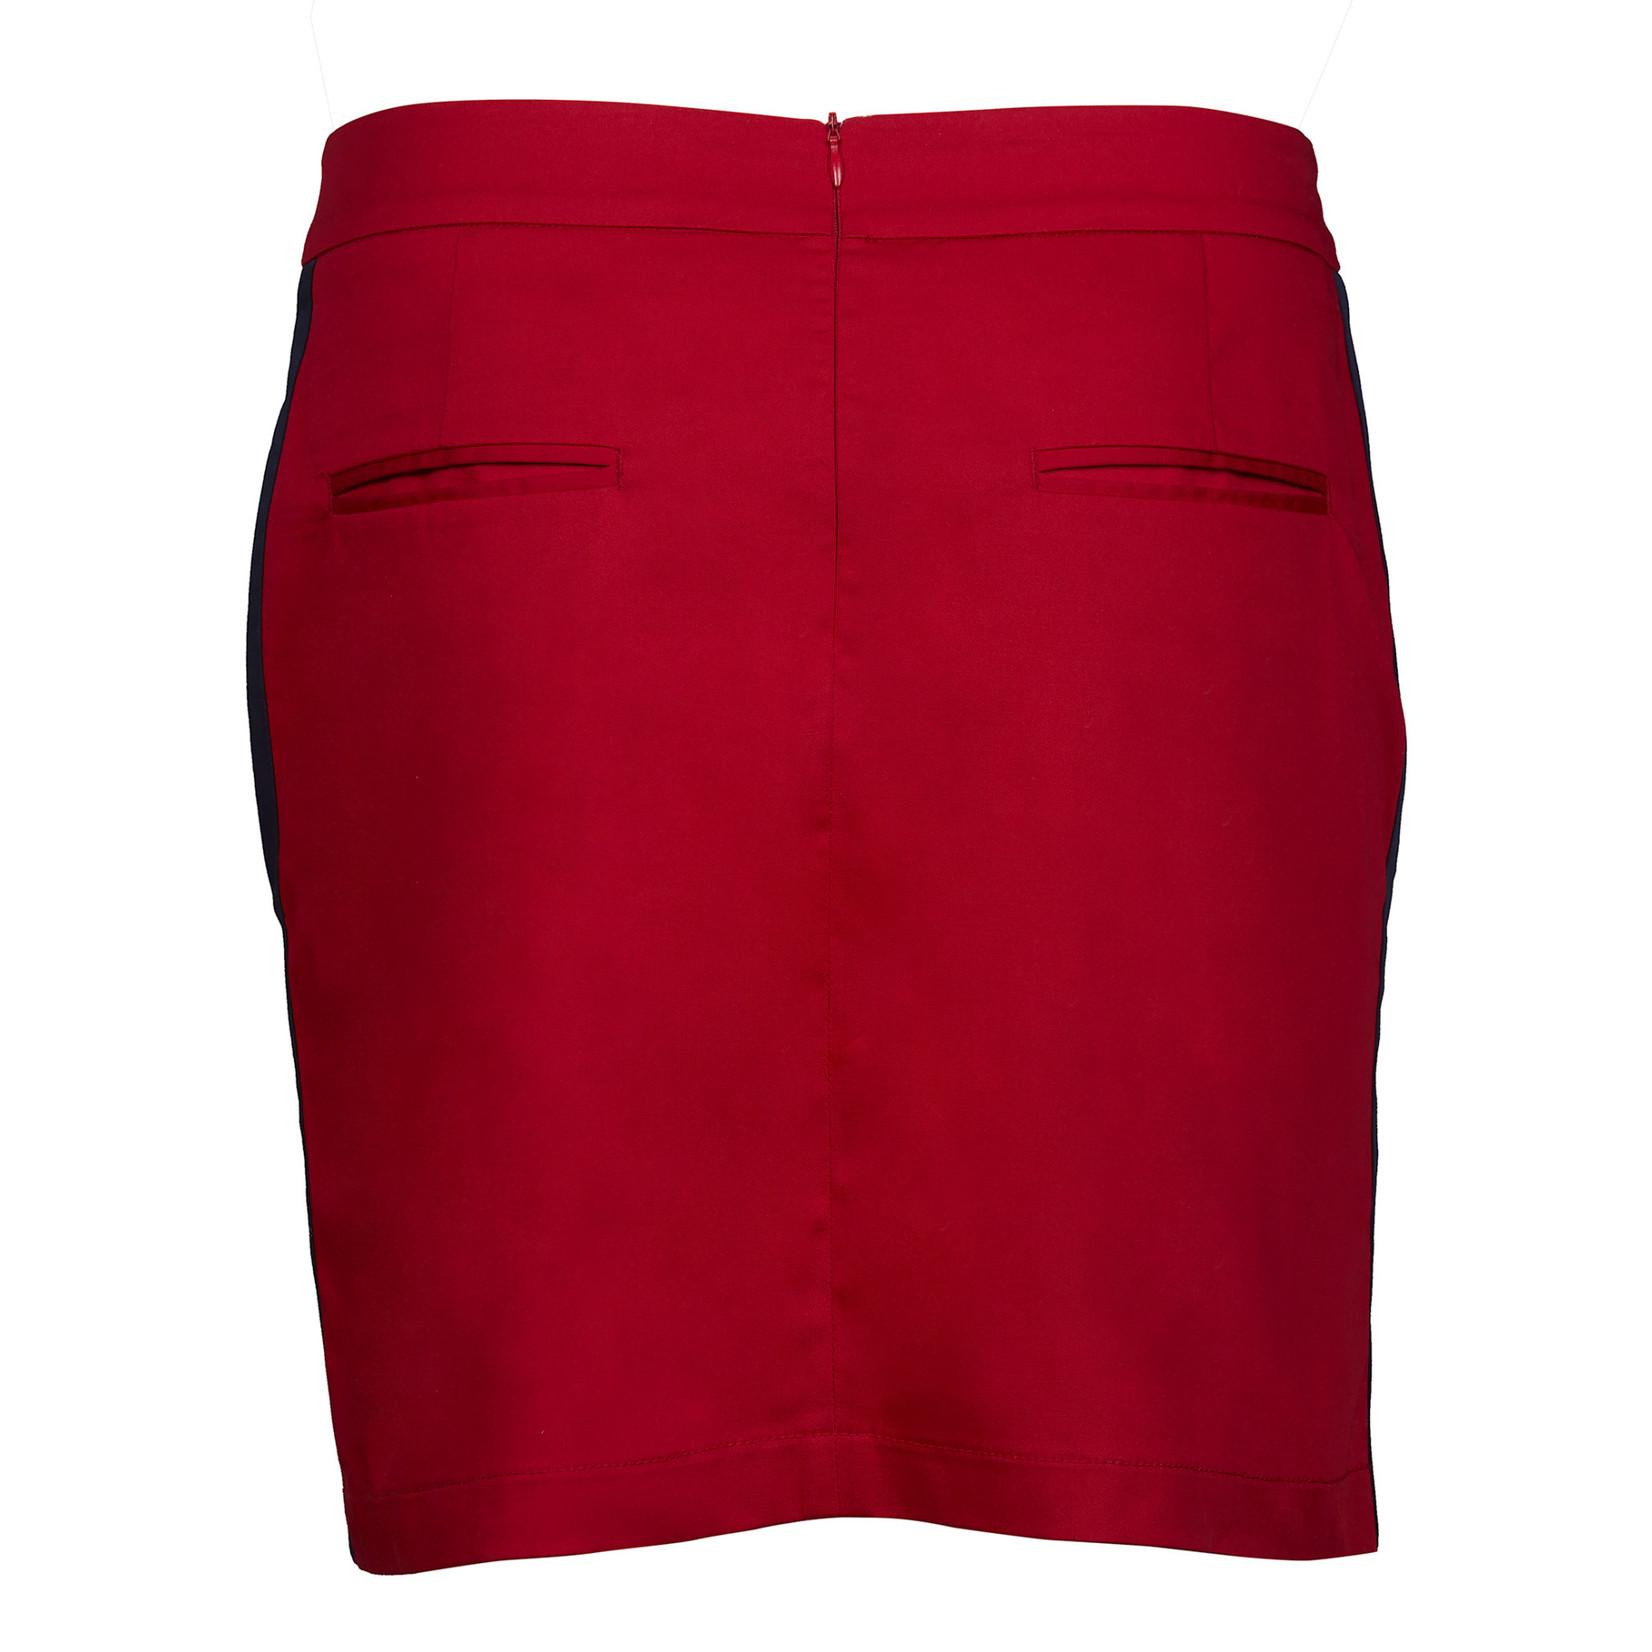 Girls Golf Girls Golf Skort - Fritzie White/Red Swing